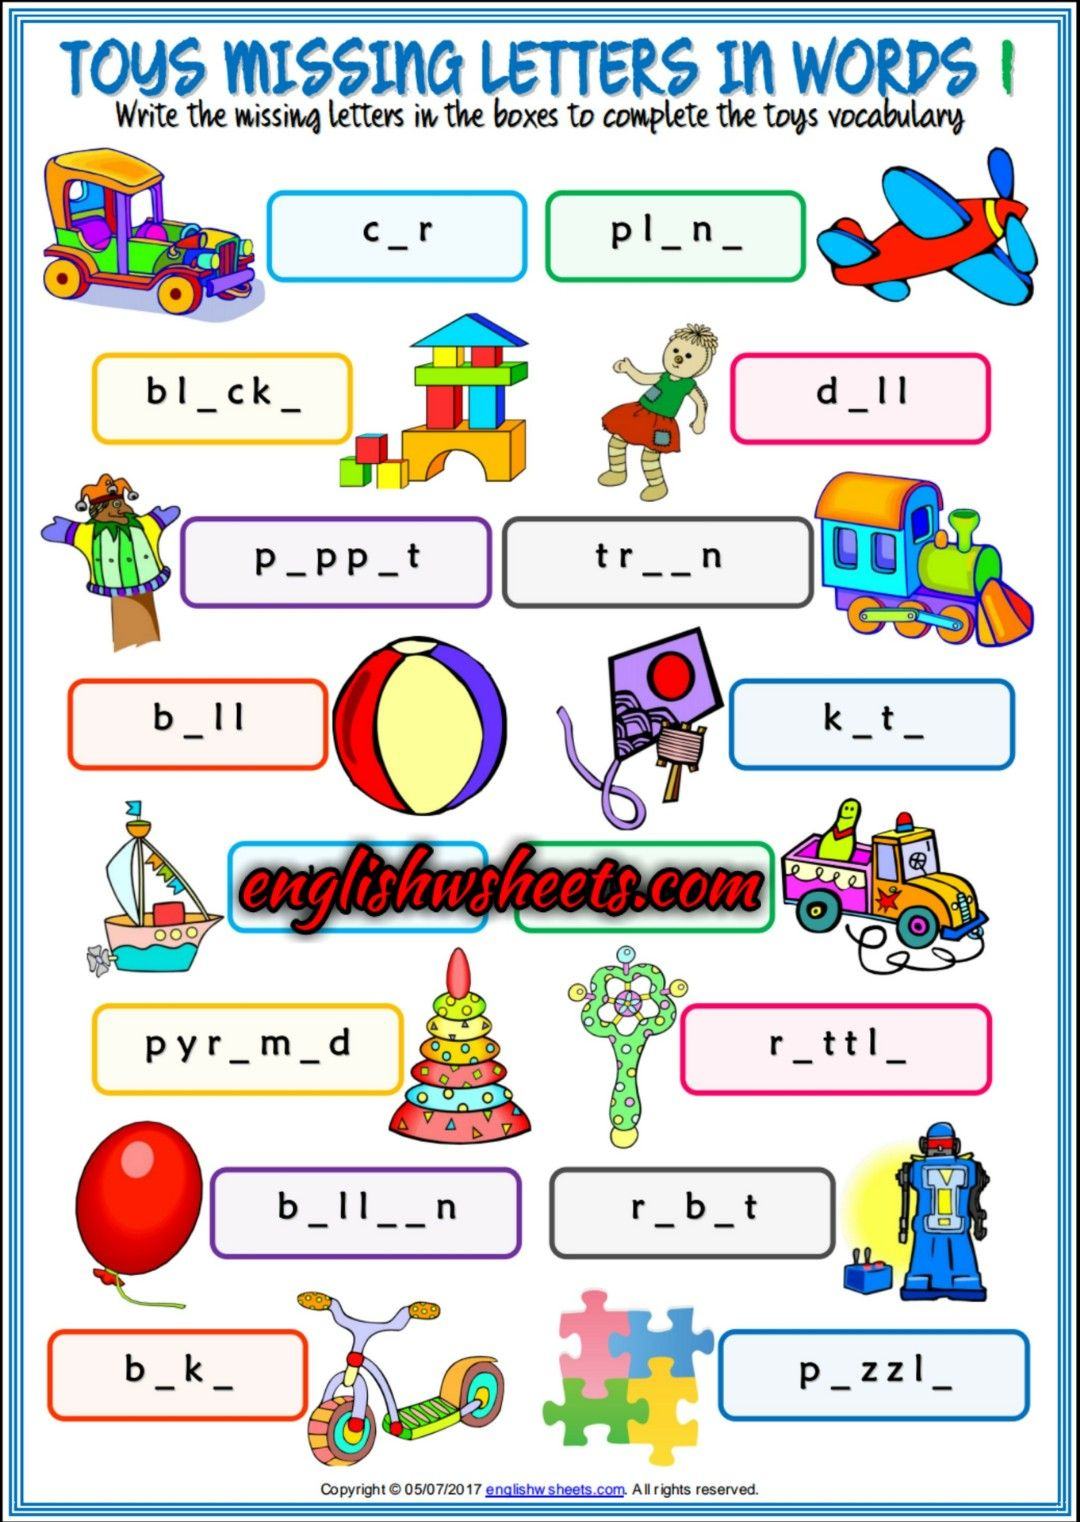 Toys Esl Printable Missing Letters In Words Worksheets For